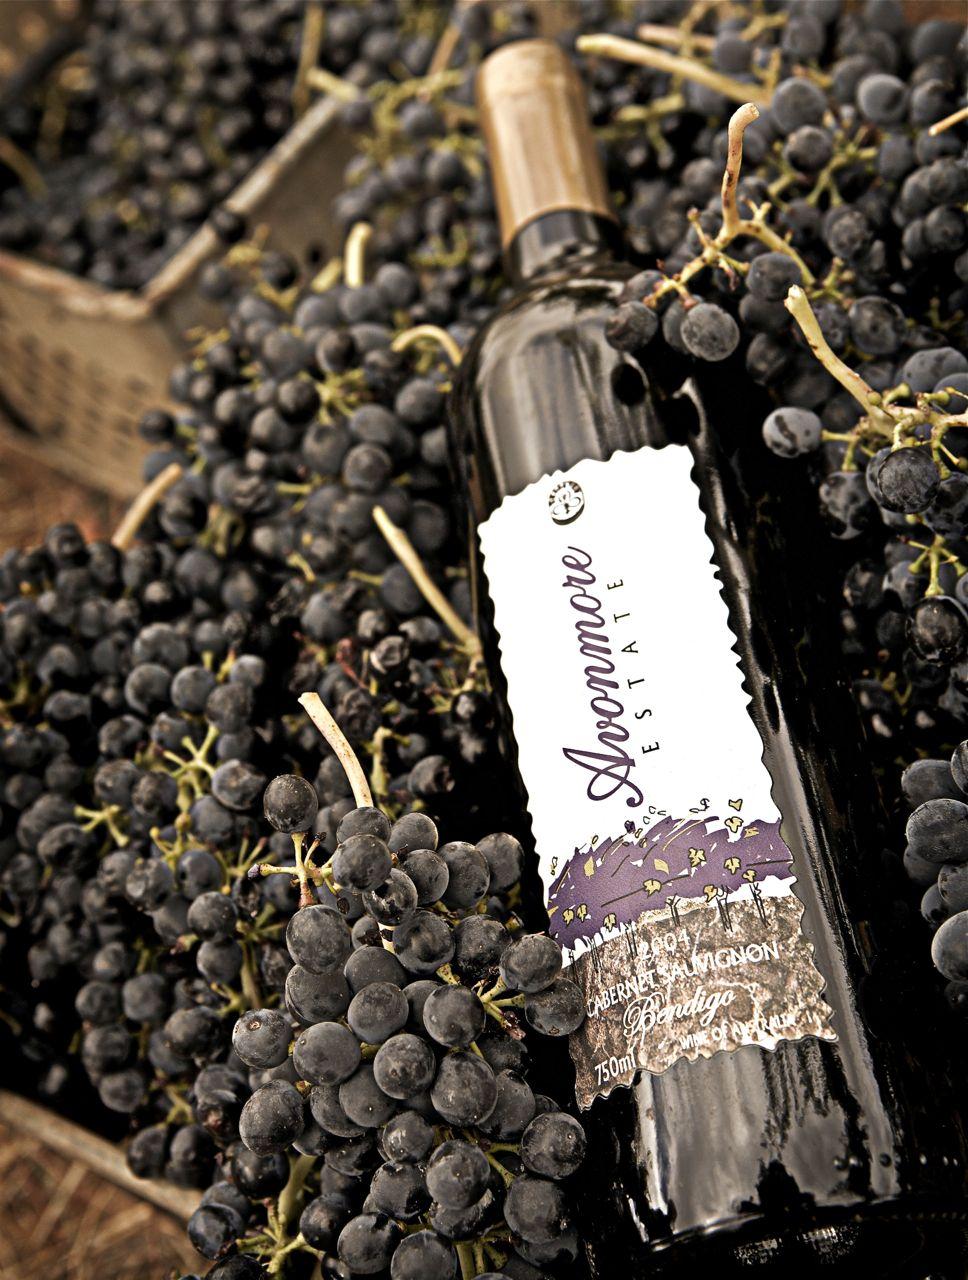 Avonmore wine in grapes 12.jpg